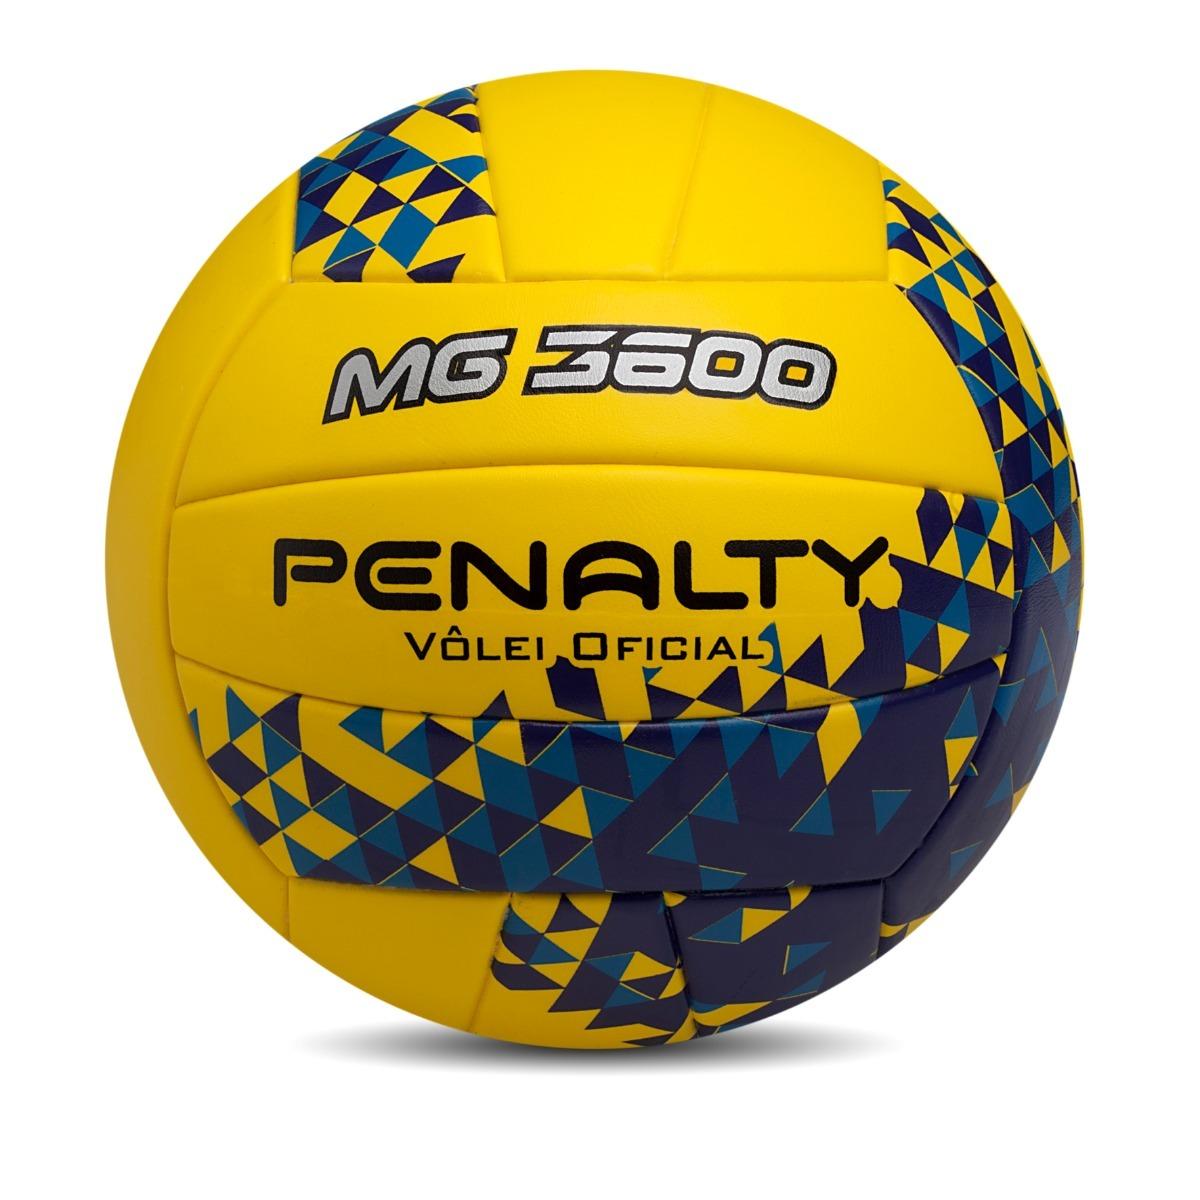 ee45637e9b kit 2 bolas vôlei penalty mg 3600 oficial 8318. Carregando zoom.